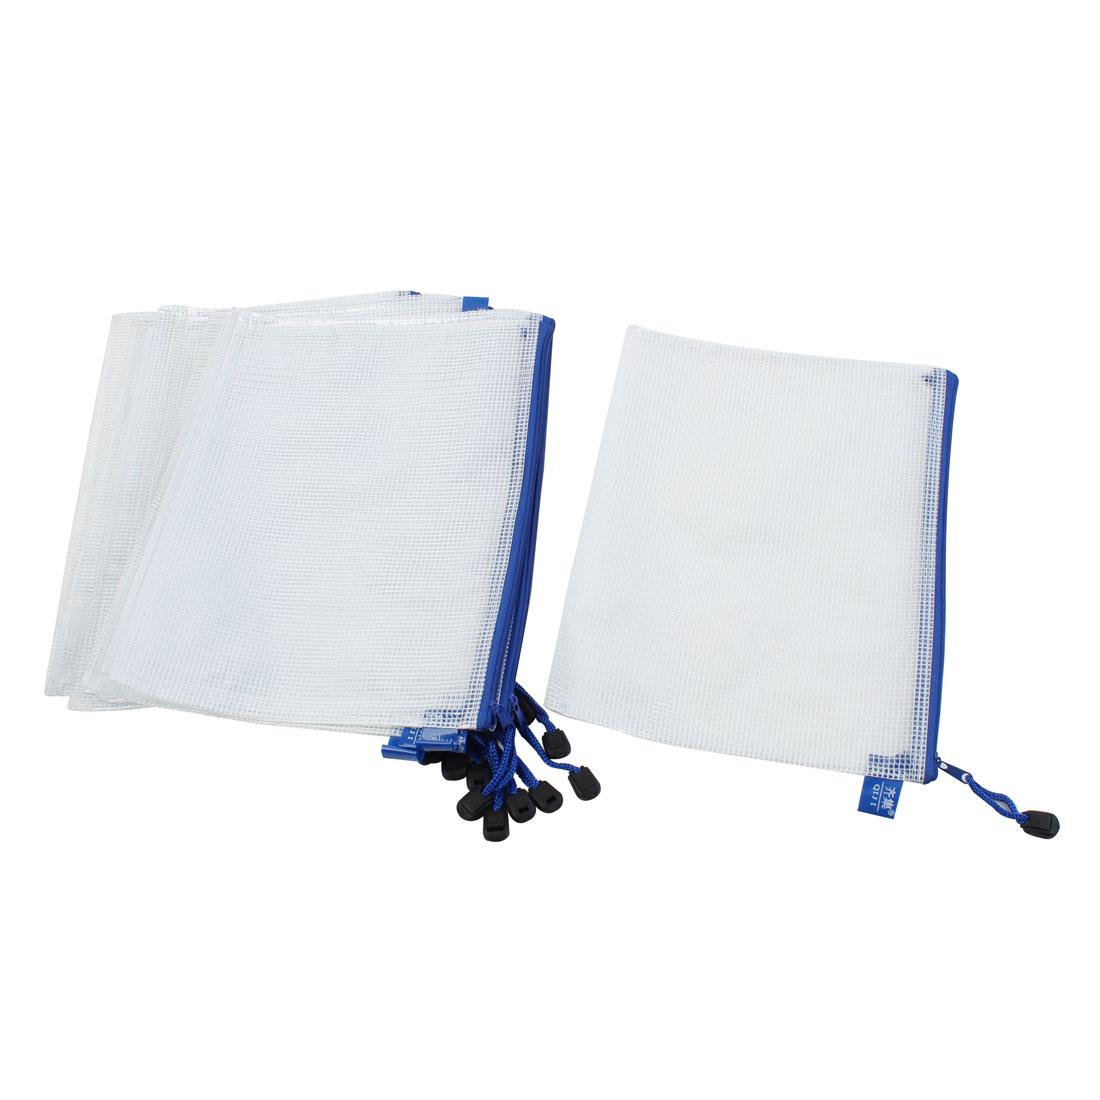 Office School Zip Up B5 Size Paper Document Art File Bag White Blue 12pcs